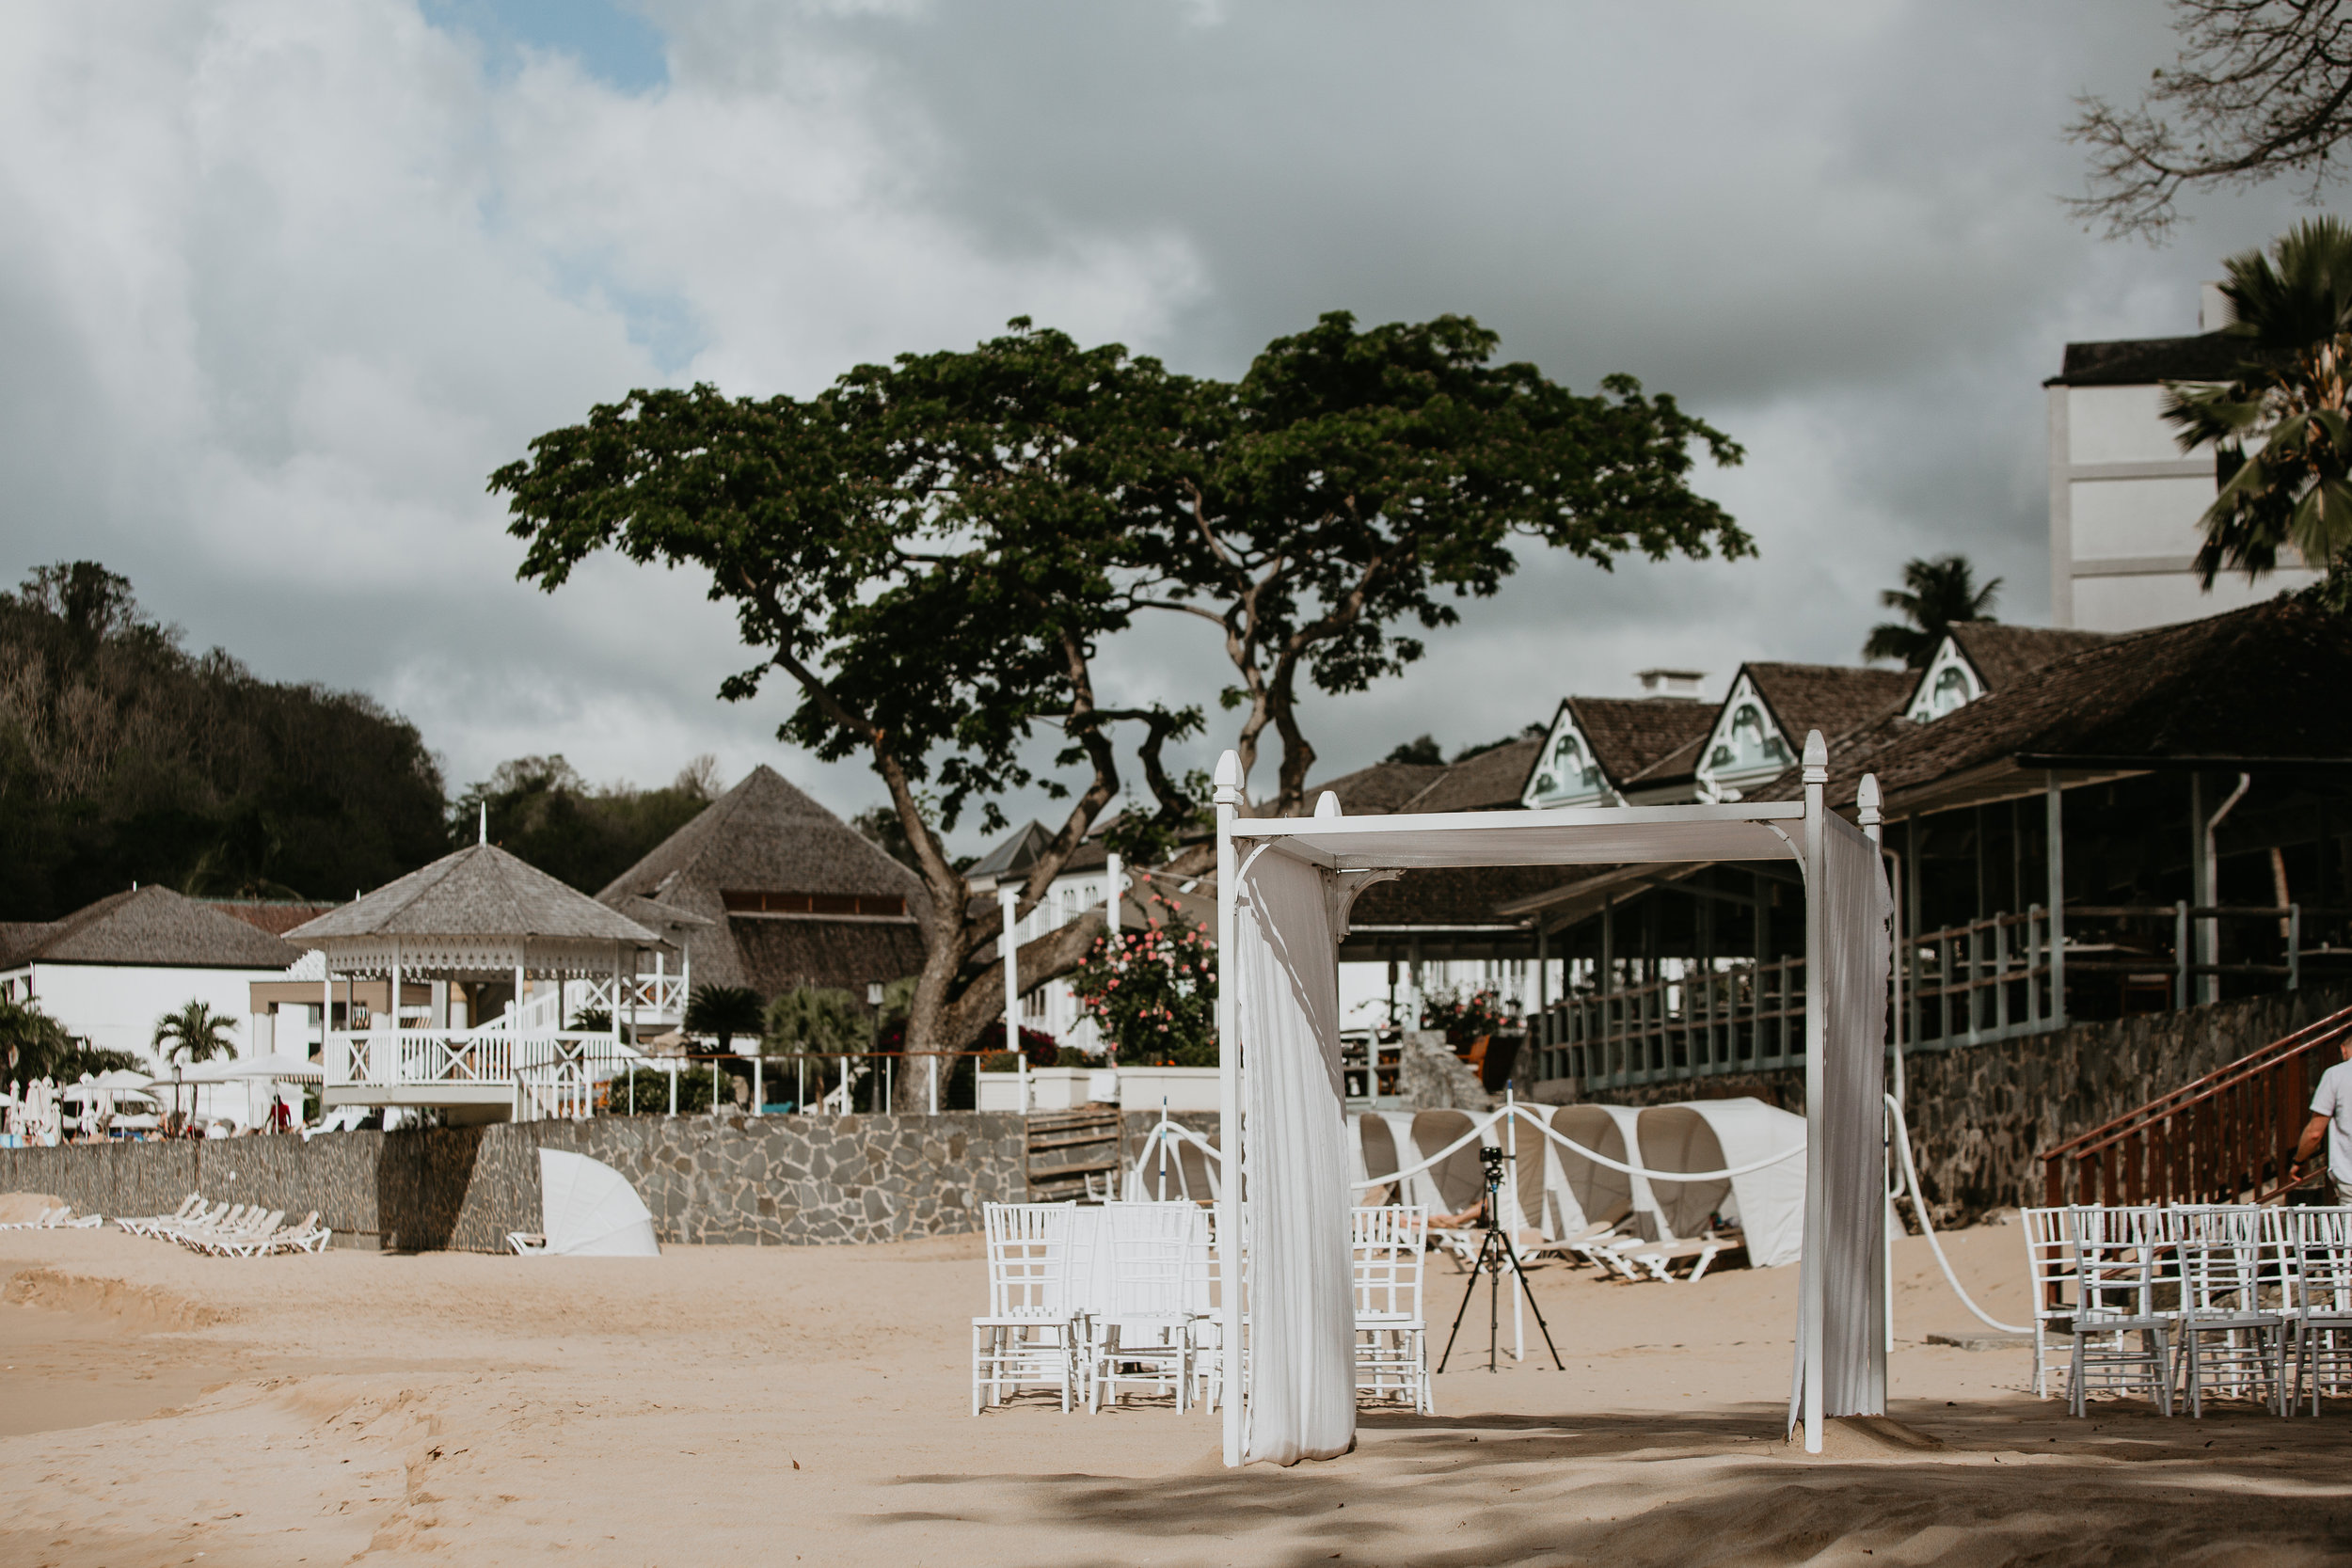 nicole-daacke-photography-destination-wedding-in-st-lucia-sandals-la-toc-intimate-island-wedding-carribean-elopement-photographer-chill-island-wedding-47.jpg